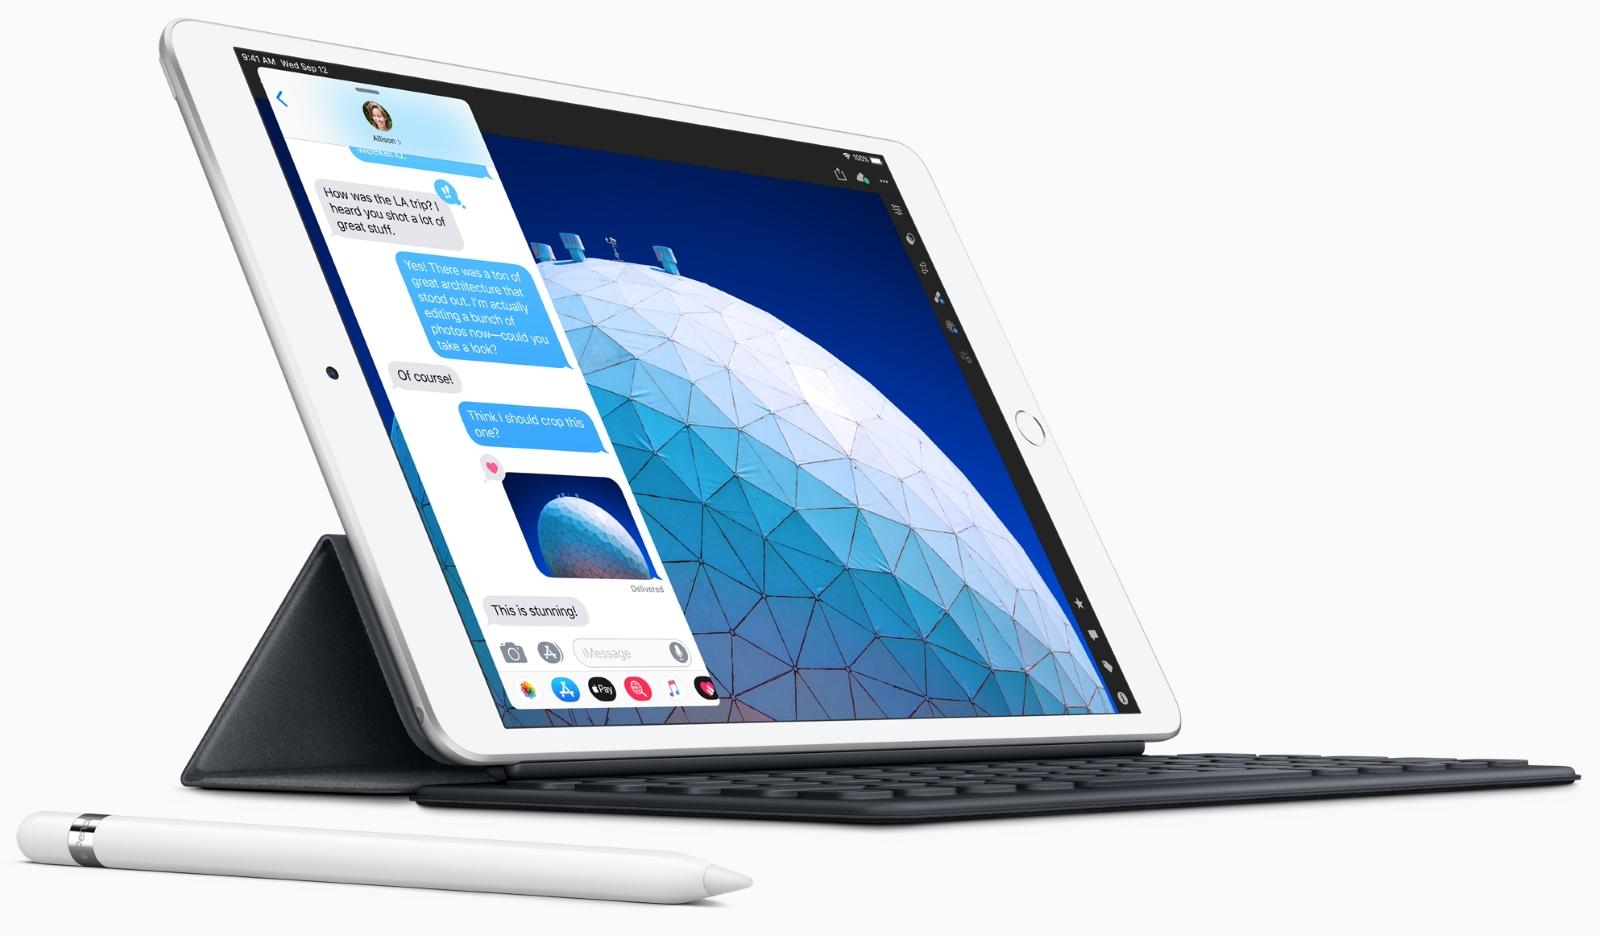 iPad Air with Pencil and keyboard